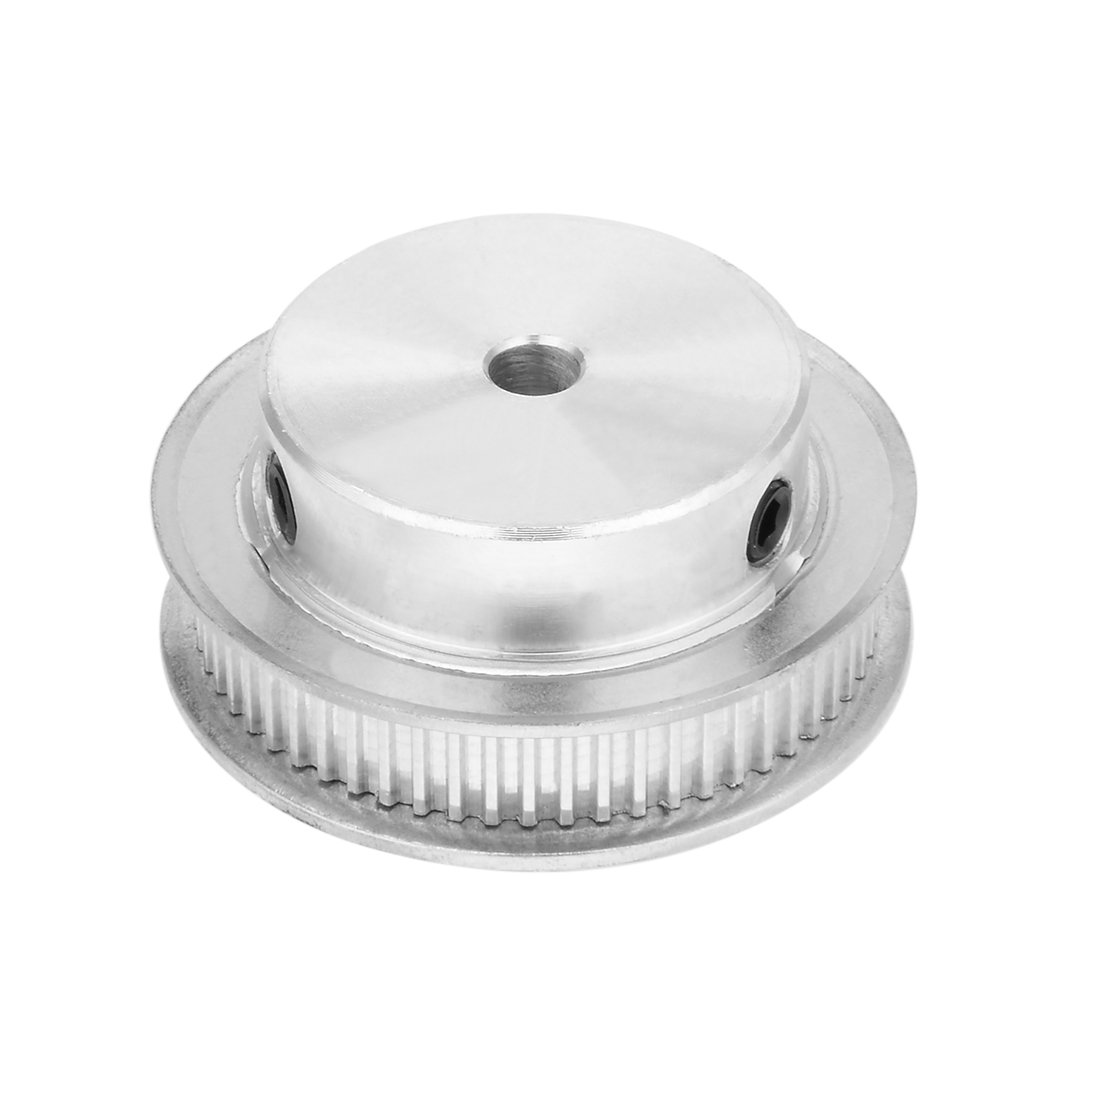 sourcingmap Aluminum MXL 30 Teeth 10mm Bore Timing Belt Idler Pulley Synchronous Wheel 6mm Belt for 3D Printer CNC